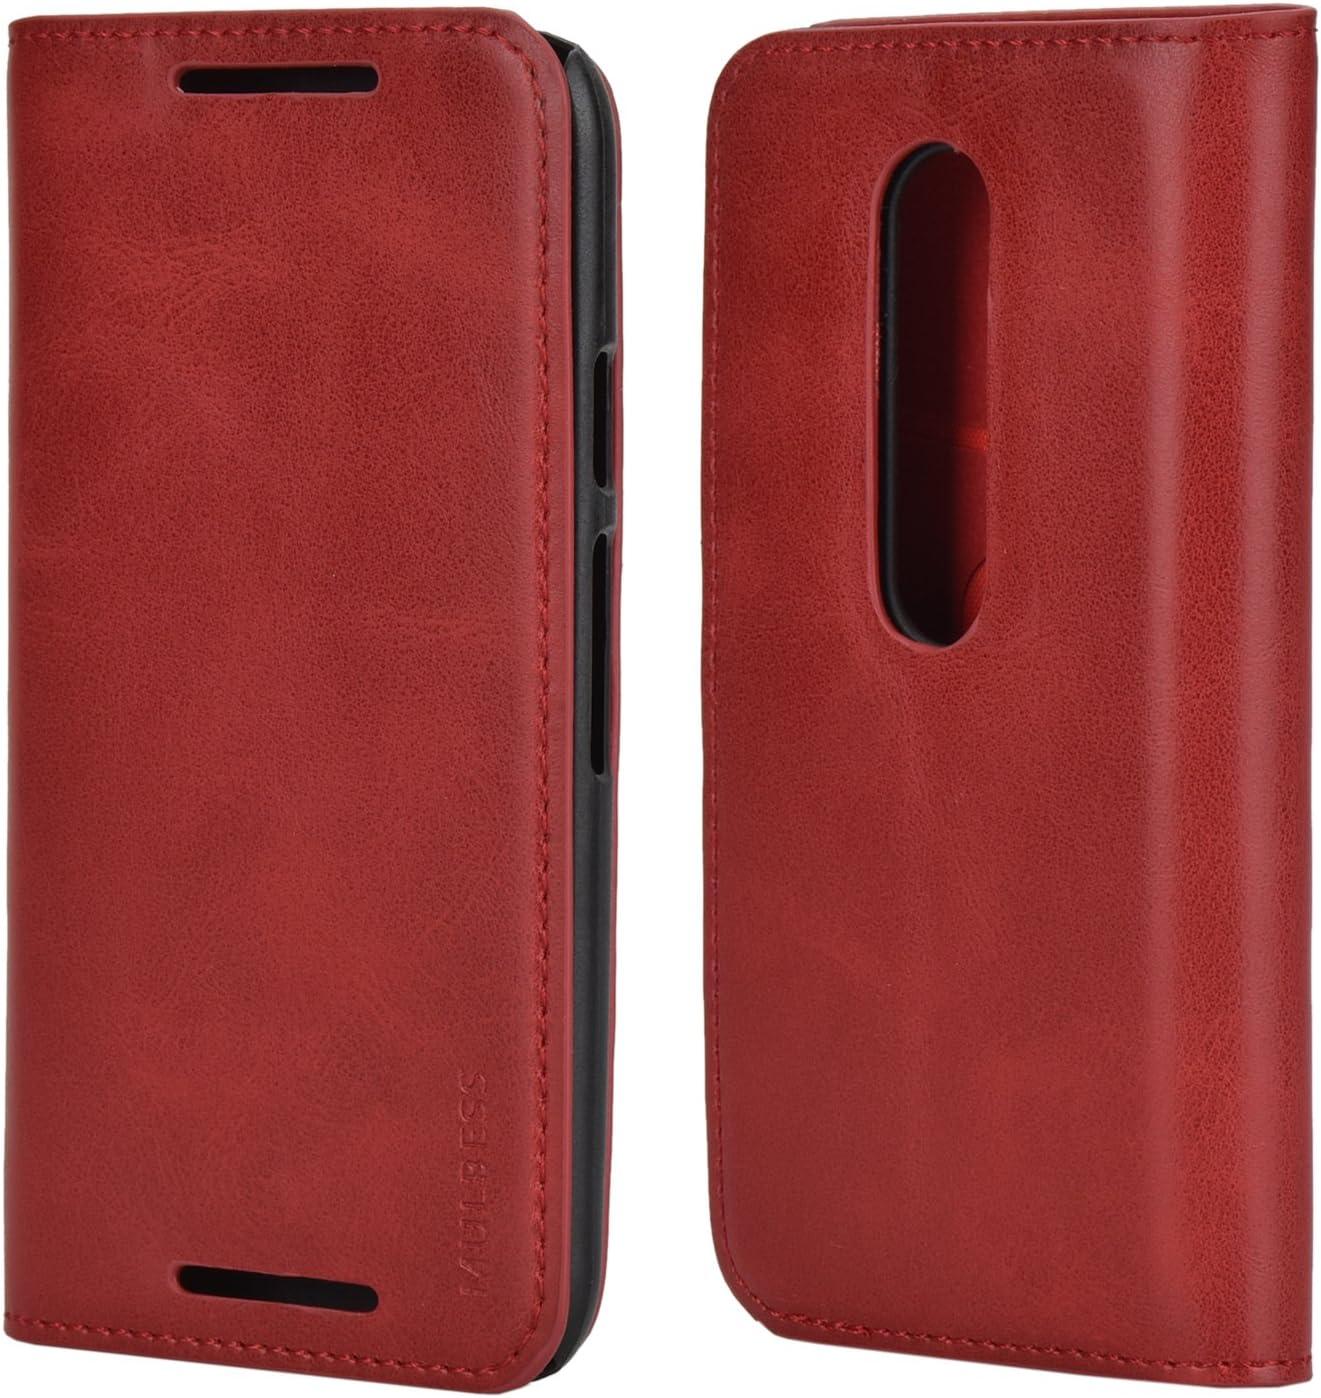 Mulbess Funda Motorola Moto G 3rd [Libro Caso Cubierta] Slim de Billetera Cuero Carcasa para Motorola Moto G 3 Gen Case, Vino Rojo